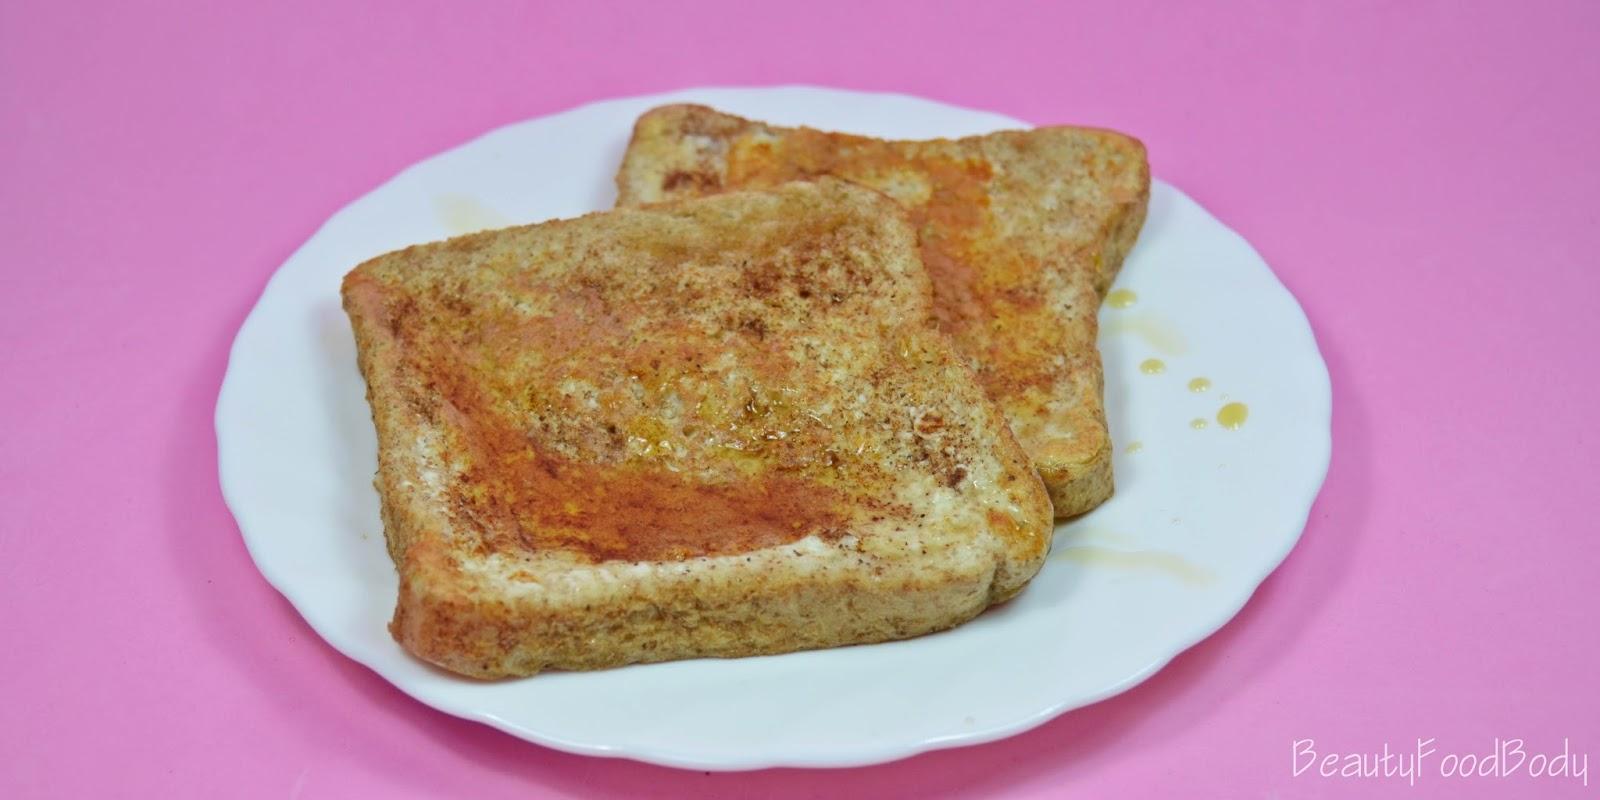 beautyfoodbody receta fit torrijas sanas french toast